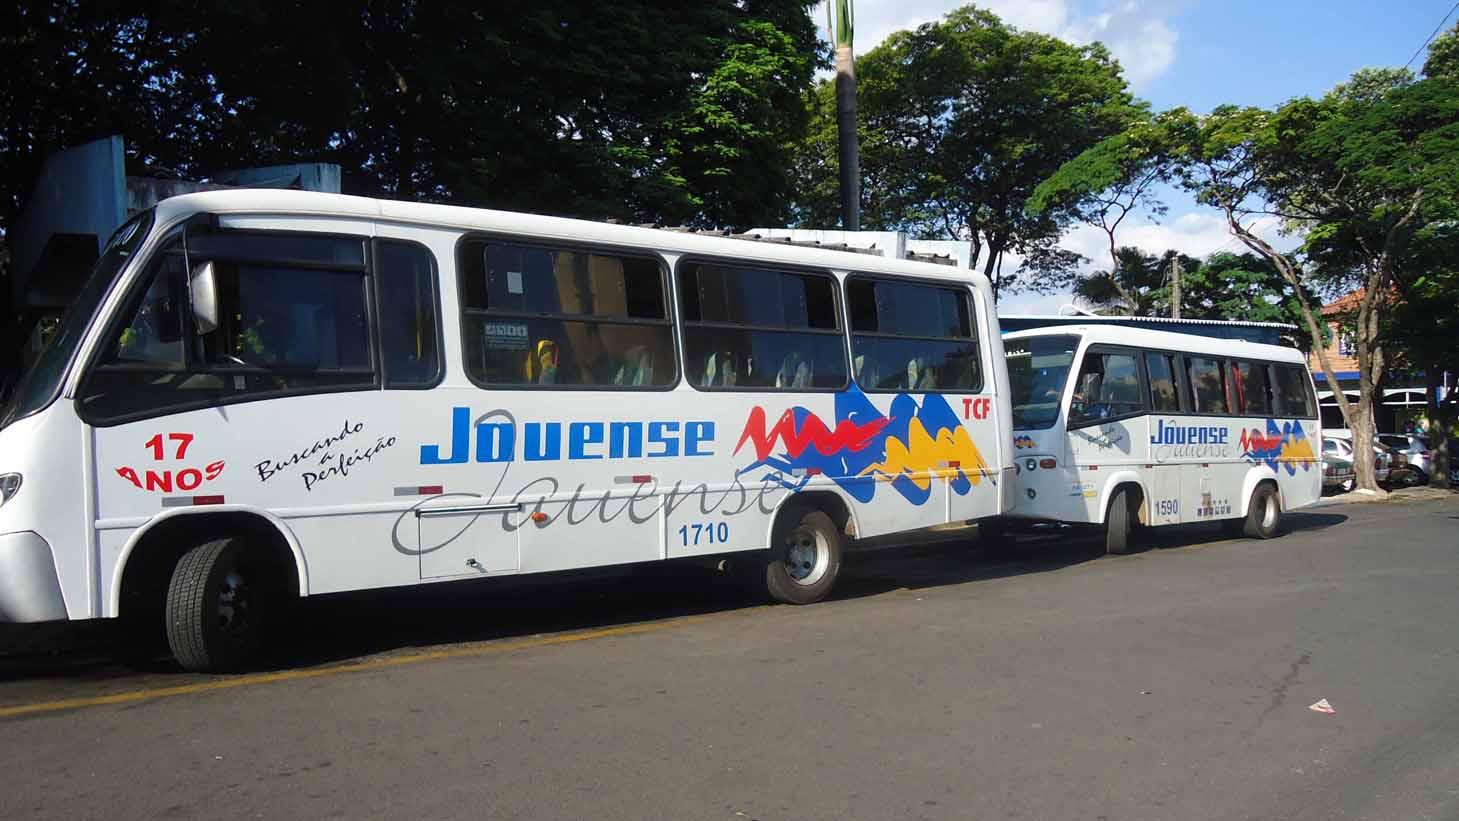 Pinato garante transporte gratuito durante a Expo Fernandópolis 2018